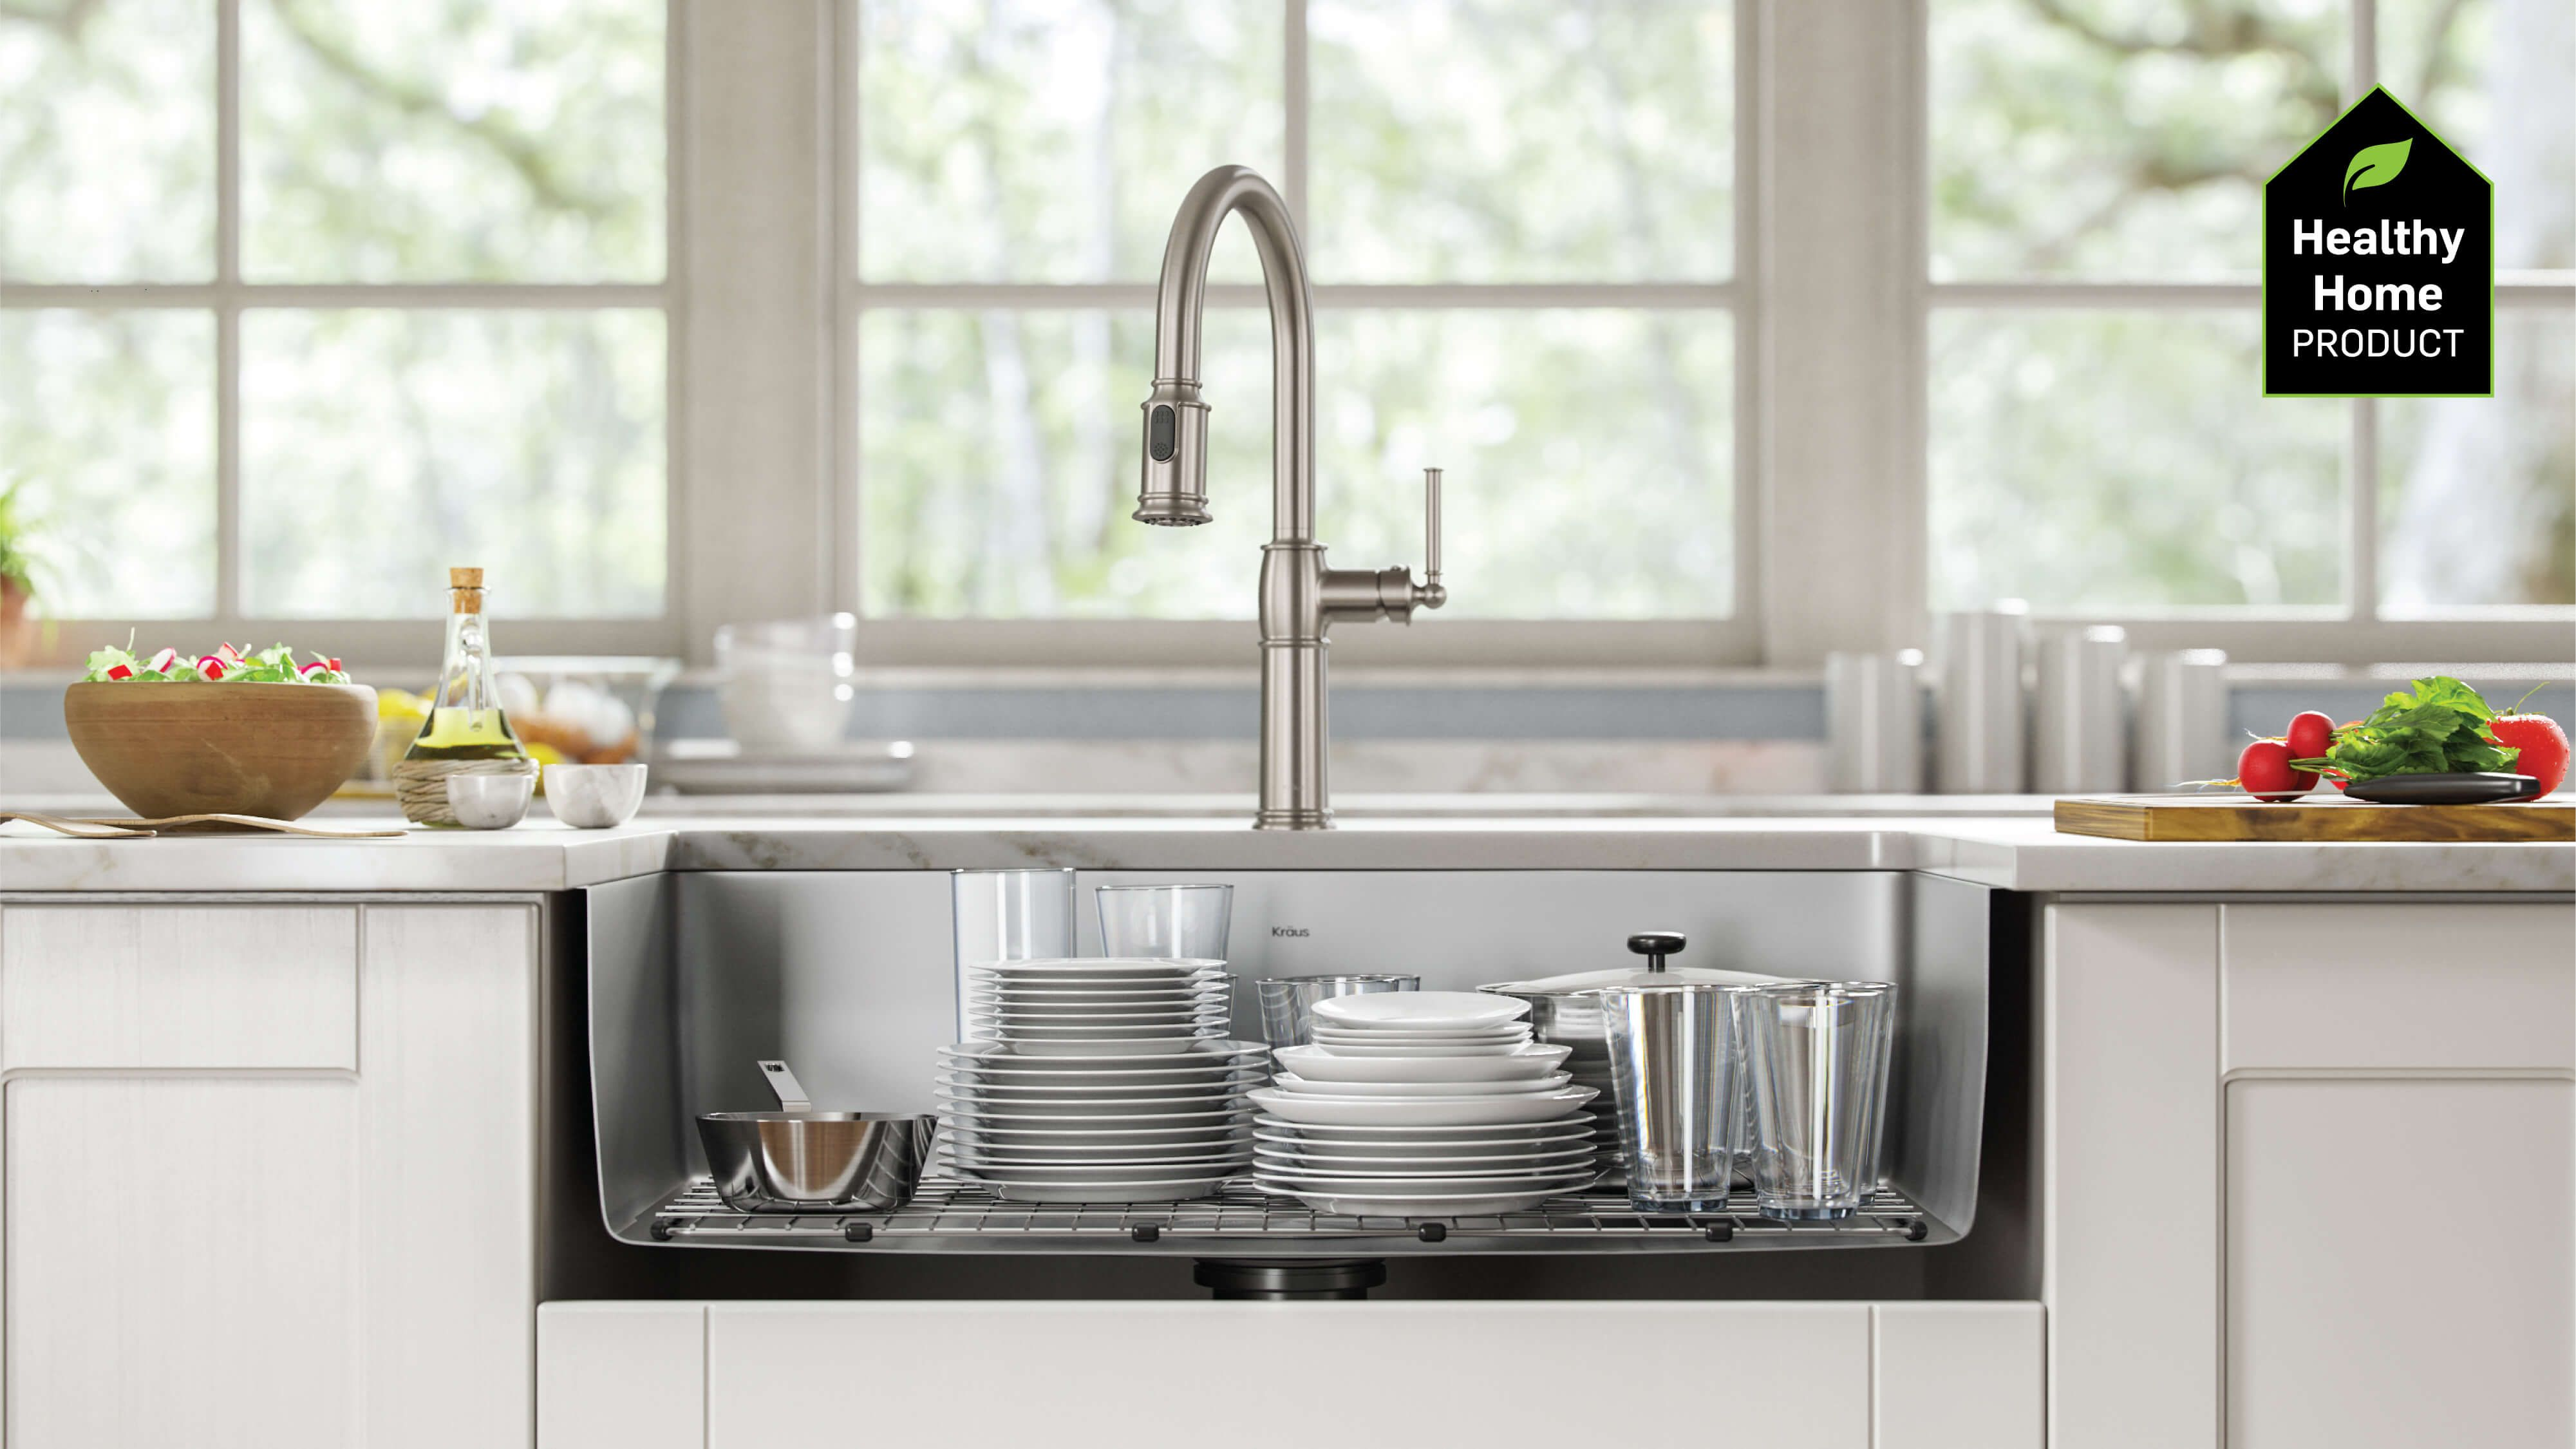 33 Undermount 16 Gauge Antibacterial Stainless Steel Single Bowl Kitchen Sink Single Bowl Kitchen Sink Versatile Kitchen Dish Rack Drying